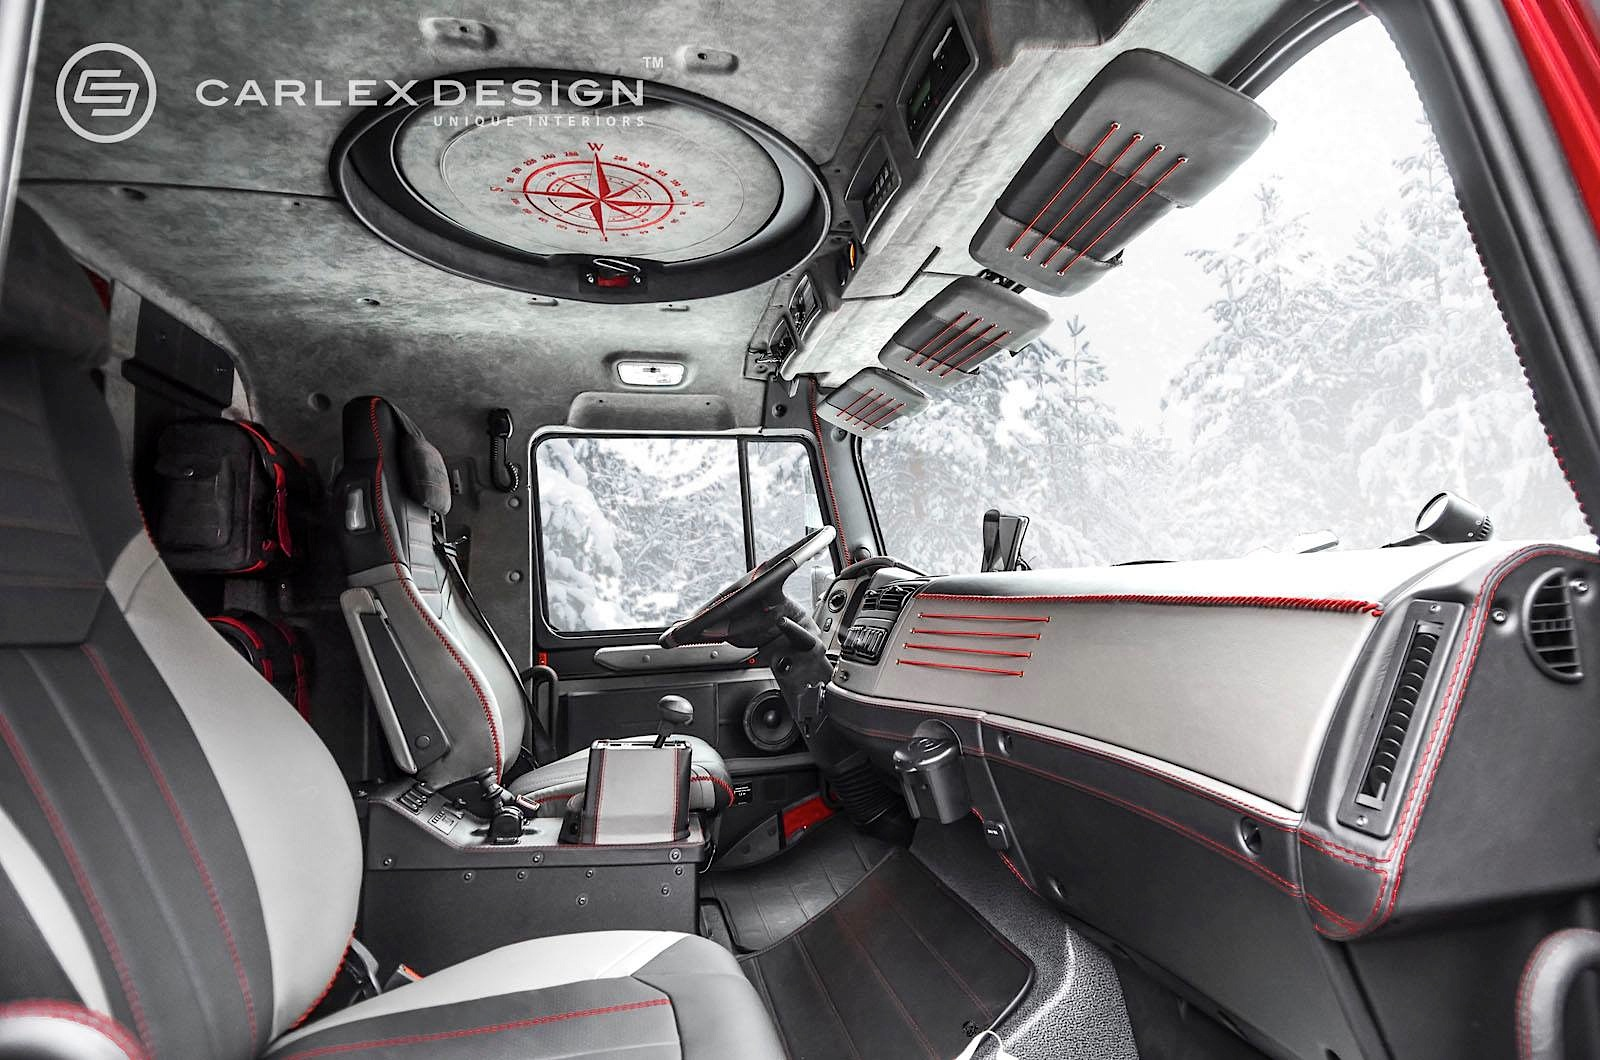 Mercedes-Benz Zetros 6x6 Gets Opulent Interior From Carlex ...